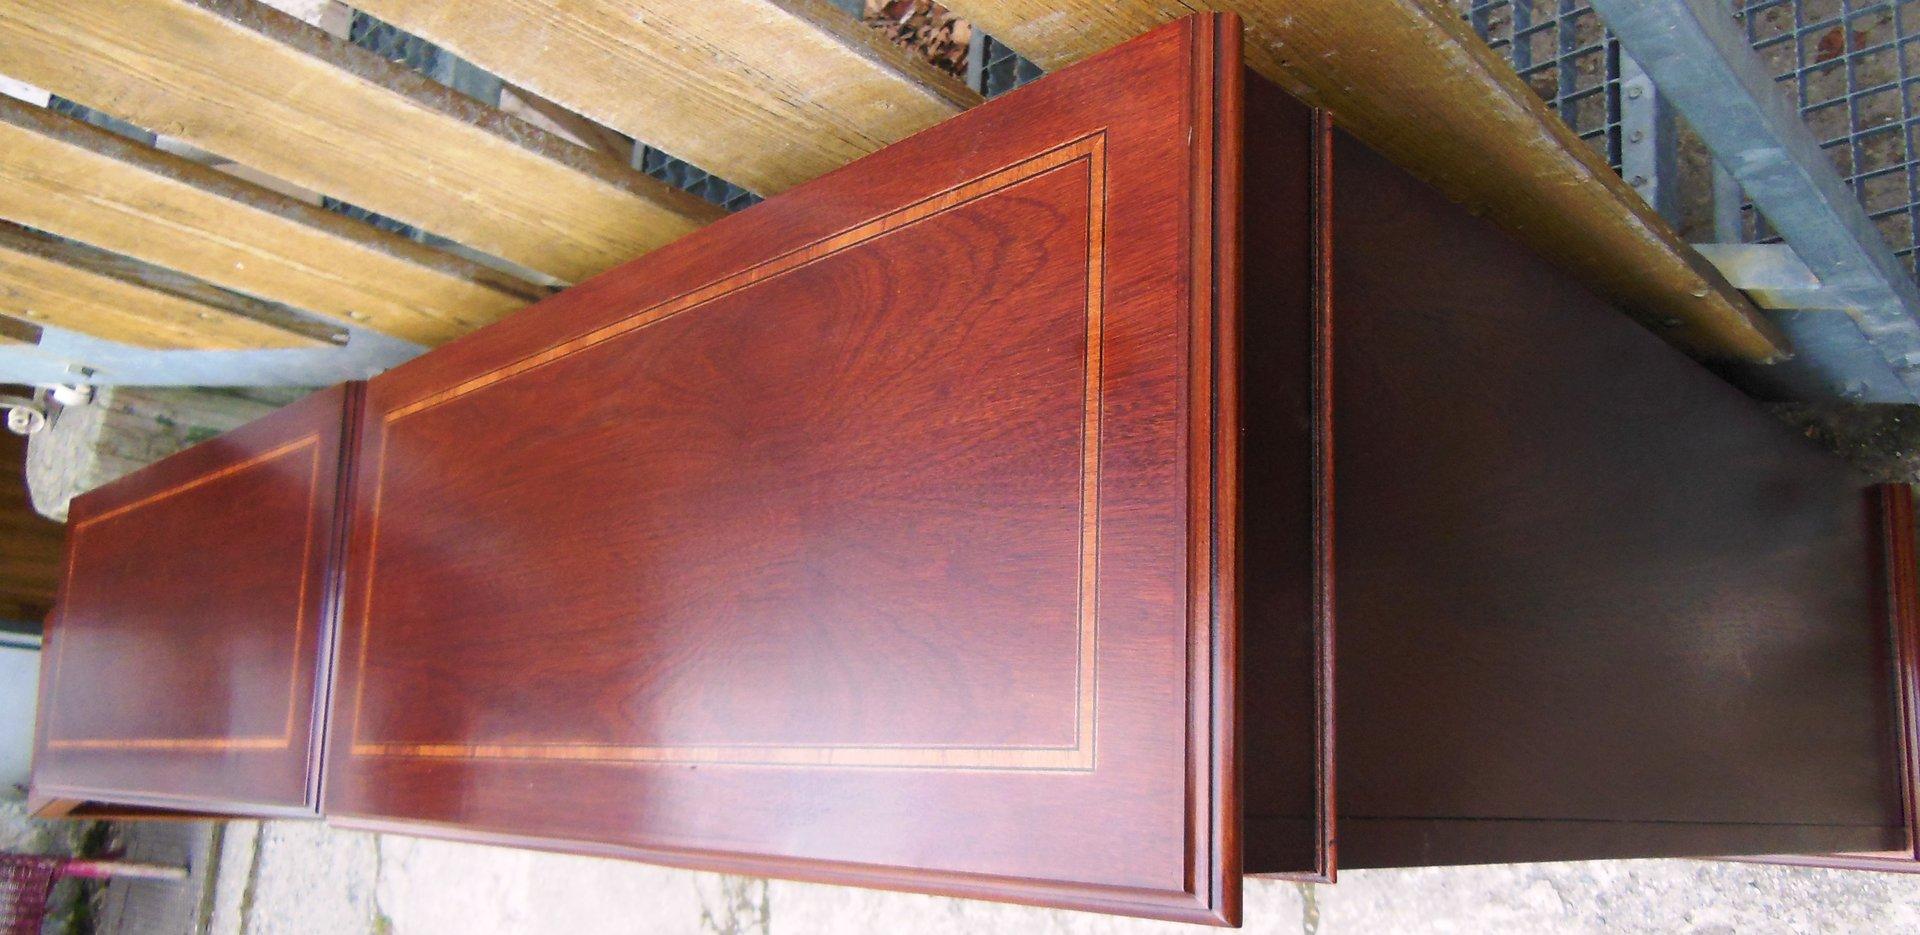 englisches b cherregal mahagoni regal englischer stil mit intarsien antik m bel antiquit ten. Black Bedroom Furniture Sets. Home Design Ideas